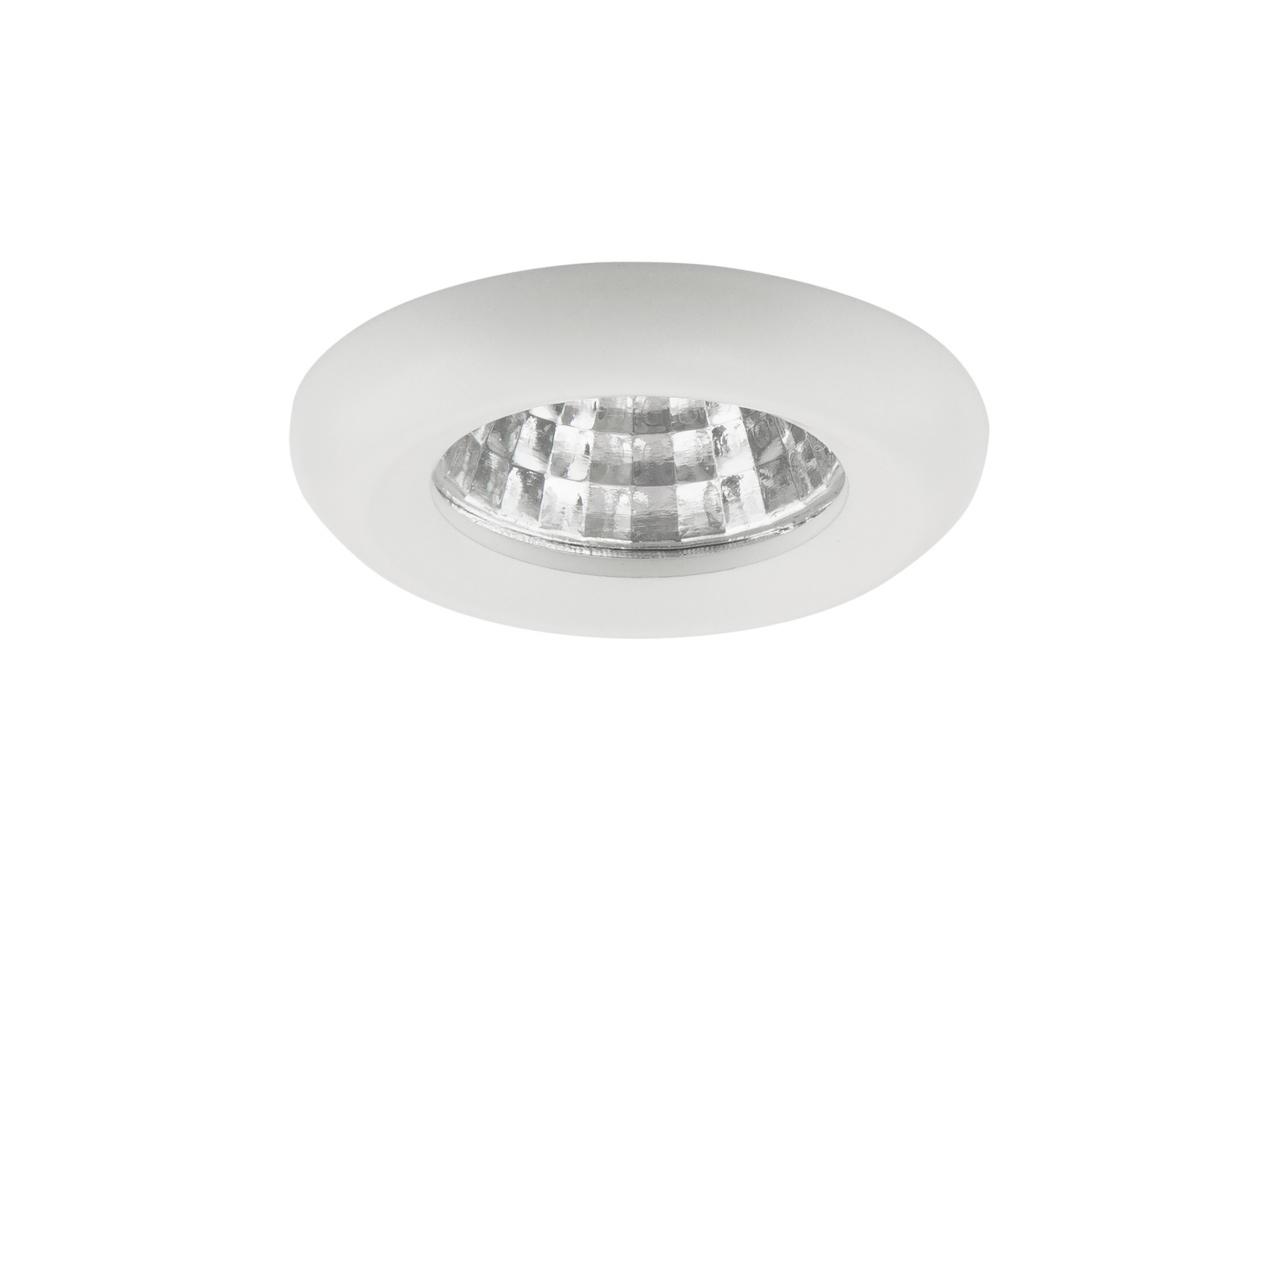 Светильник Monde LED 1W 80LM 18G белый 3000K Lightstar 071016